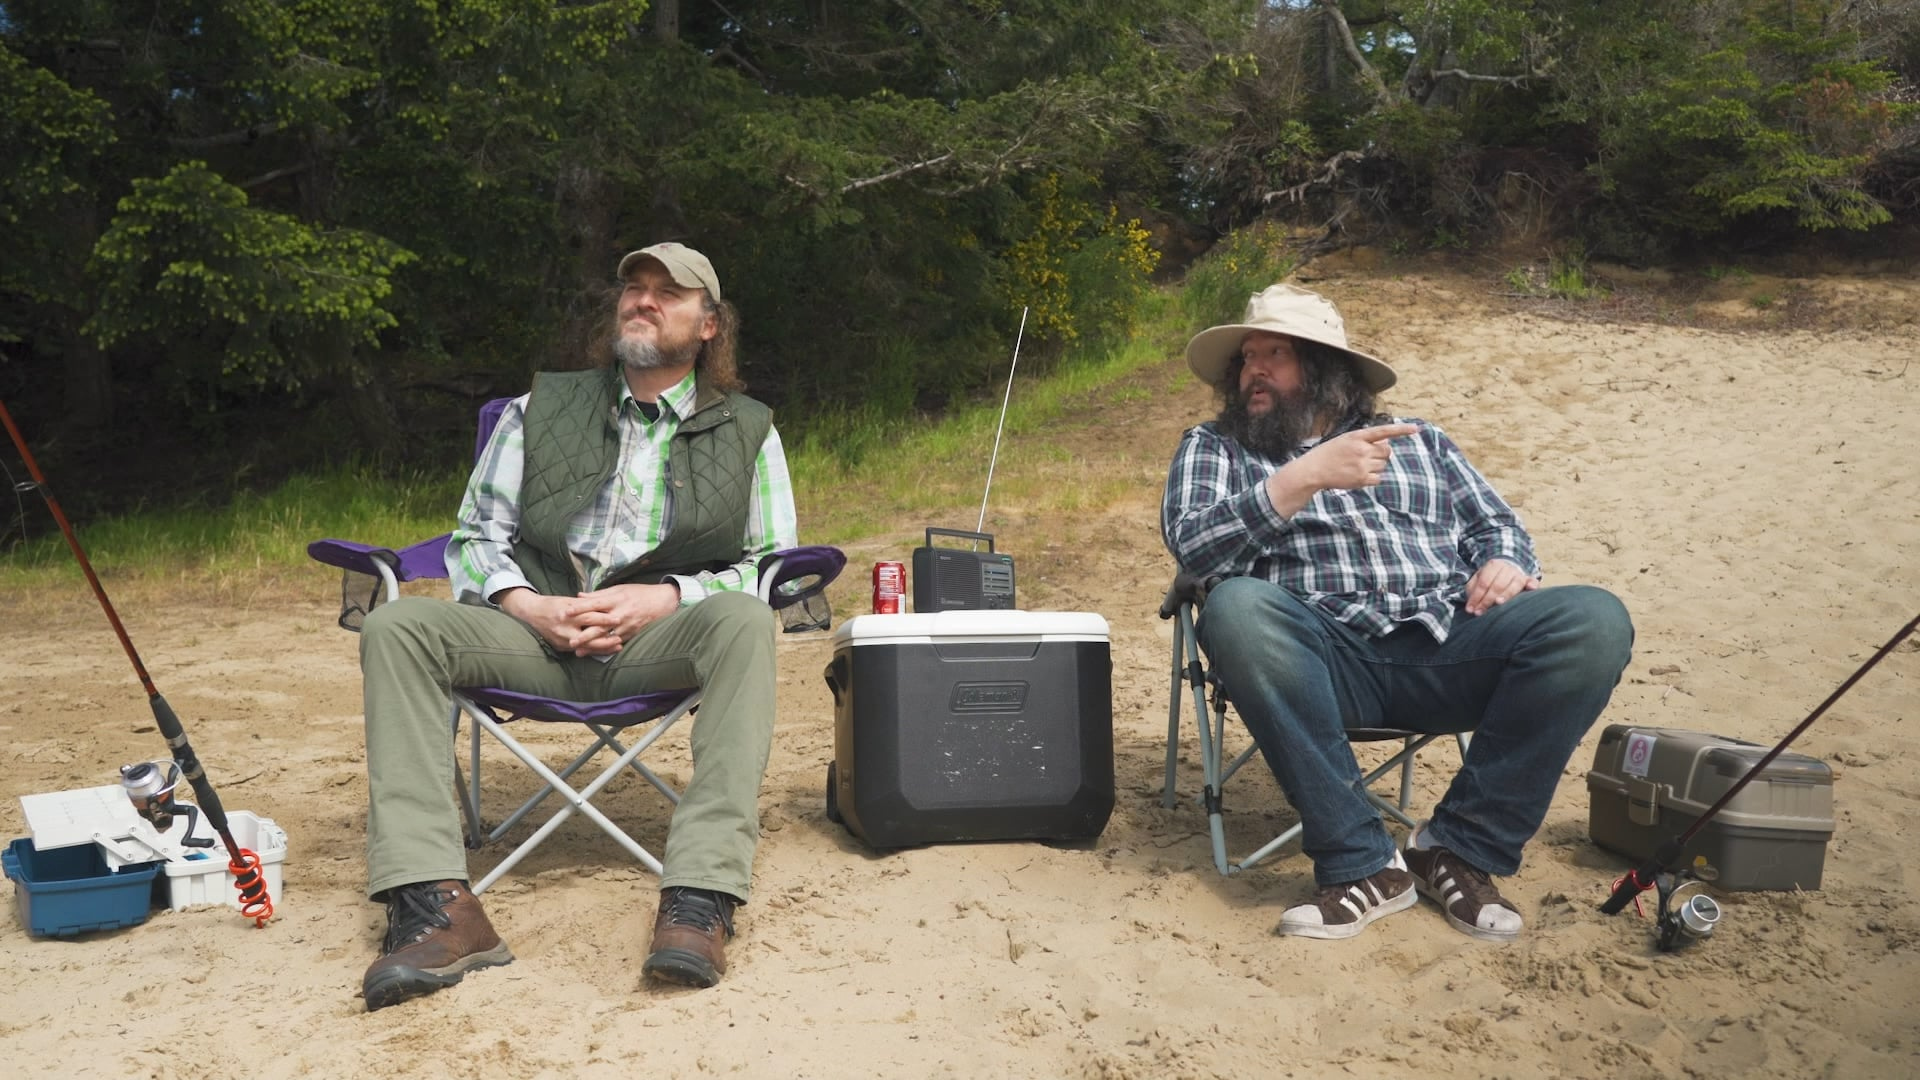 Fishing Buds